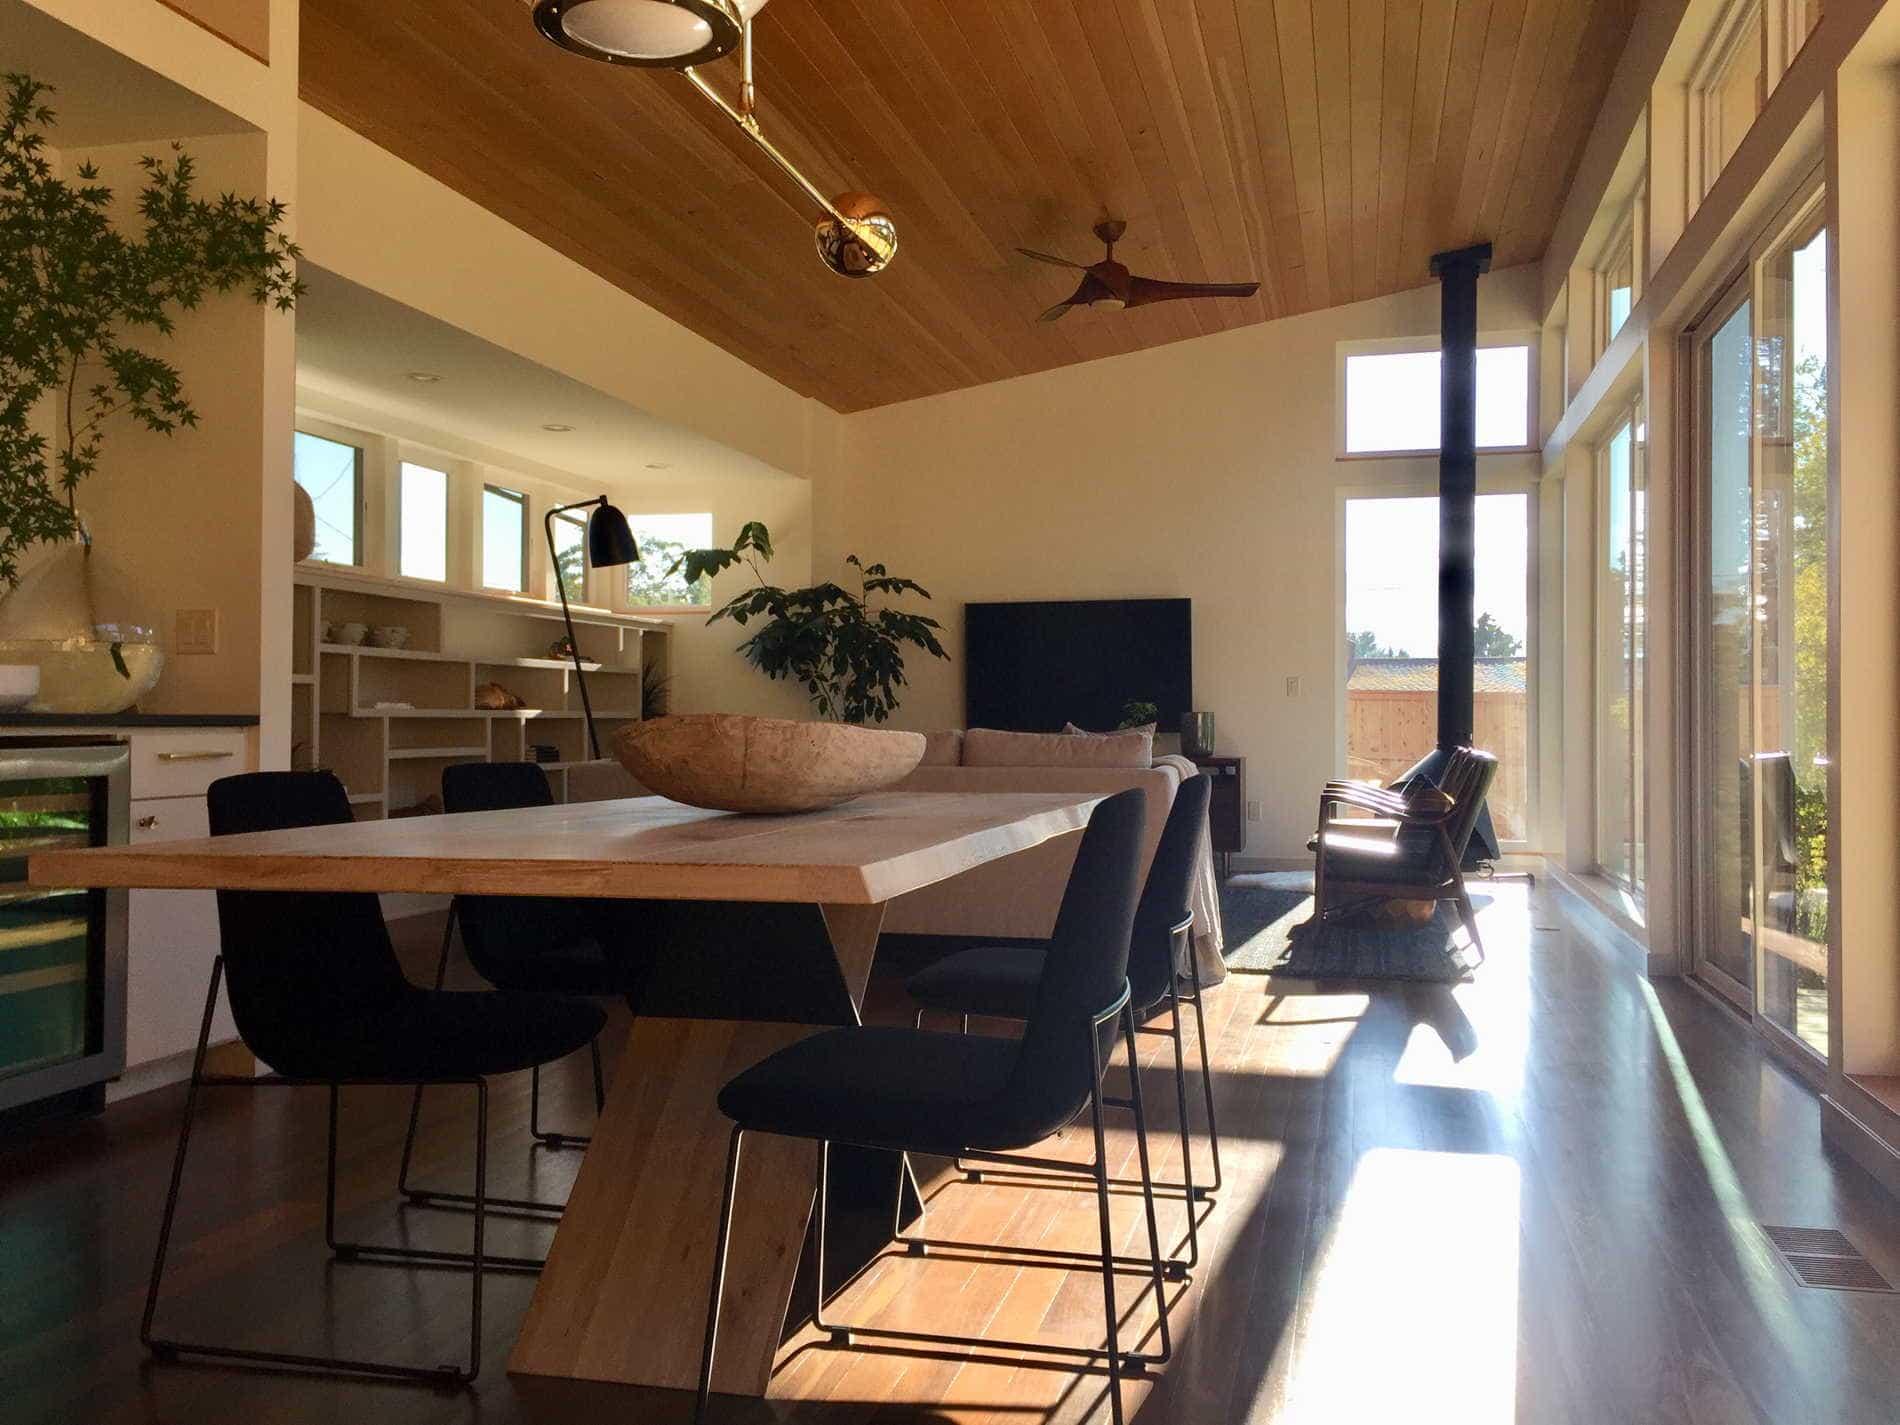 Terra Firma Home interior designer write about renovation trends.